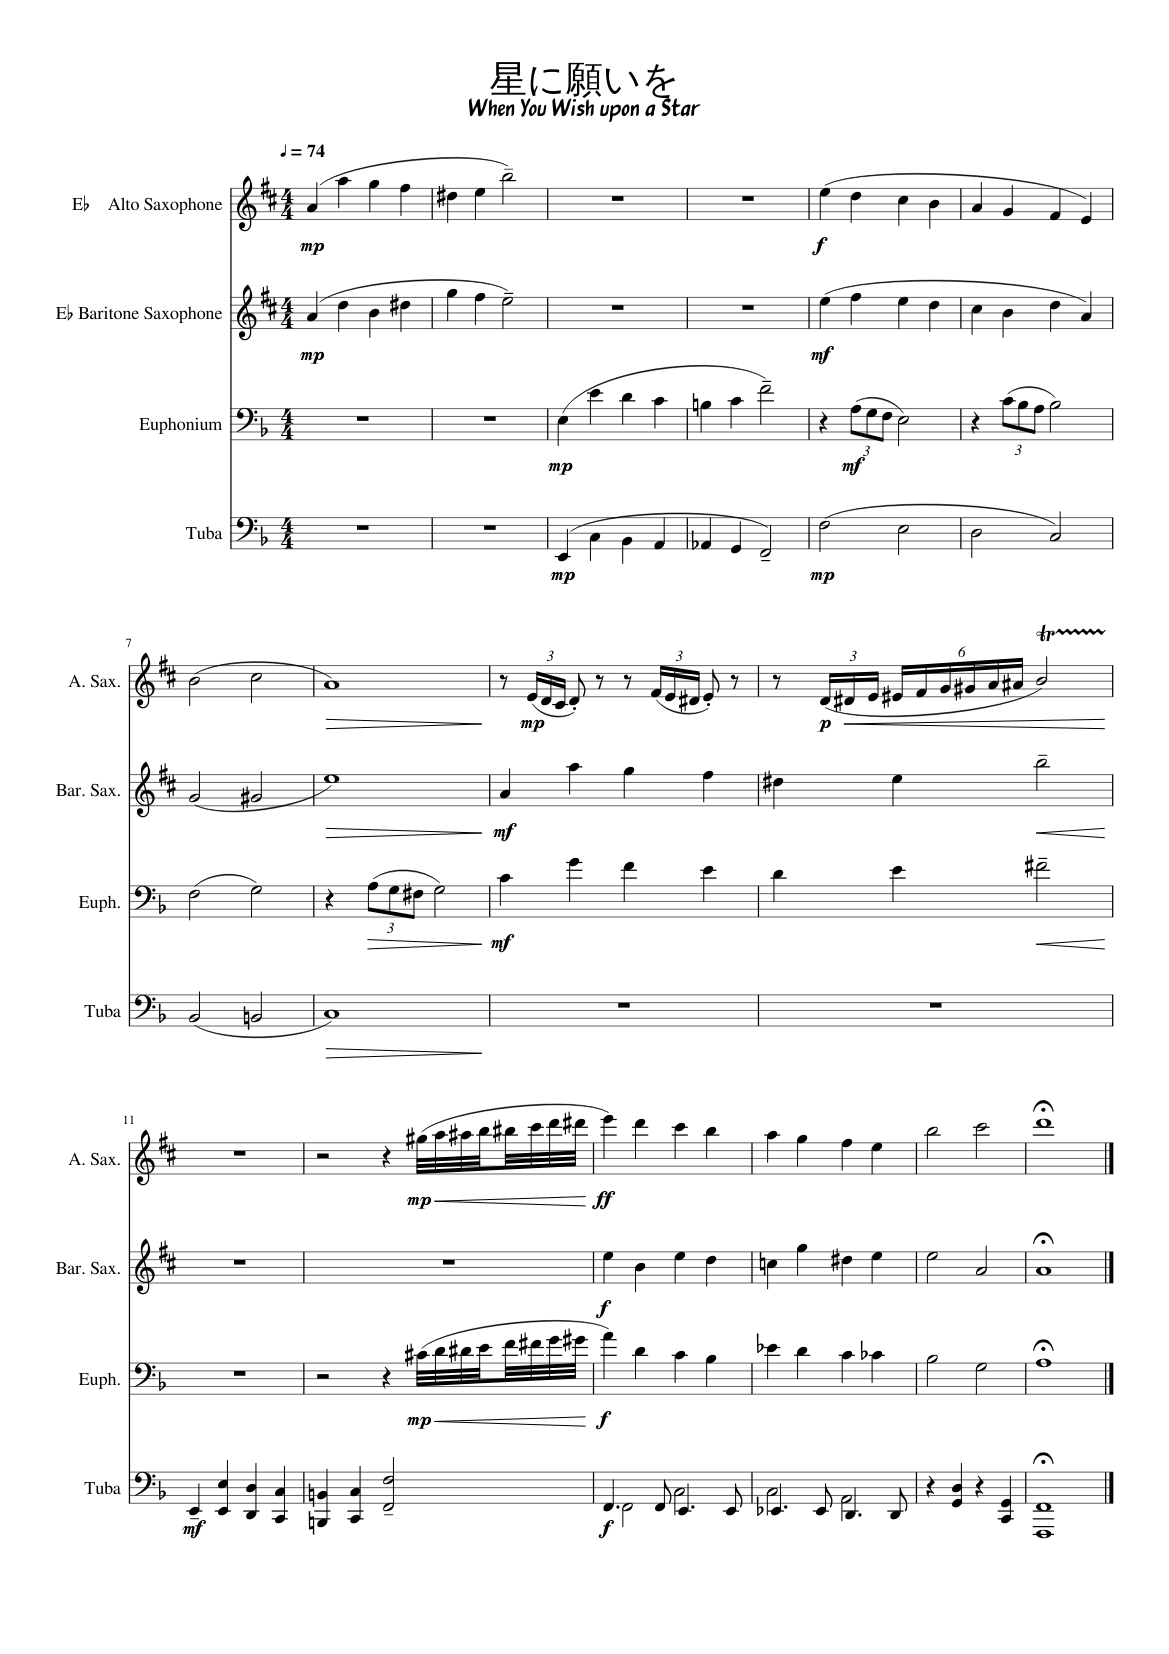 Pinocchio | when you wish upon a star | flute choir sheet music.